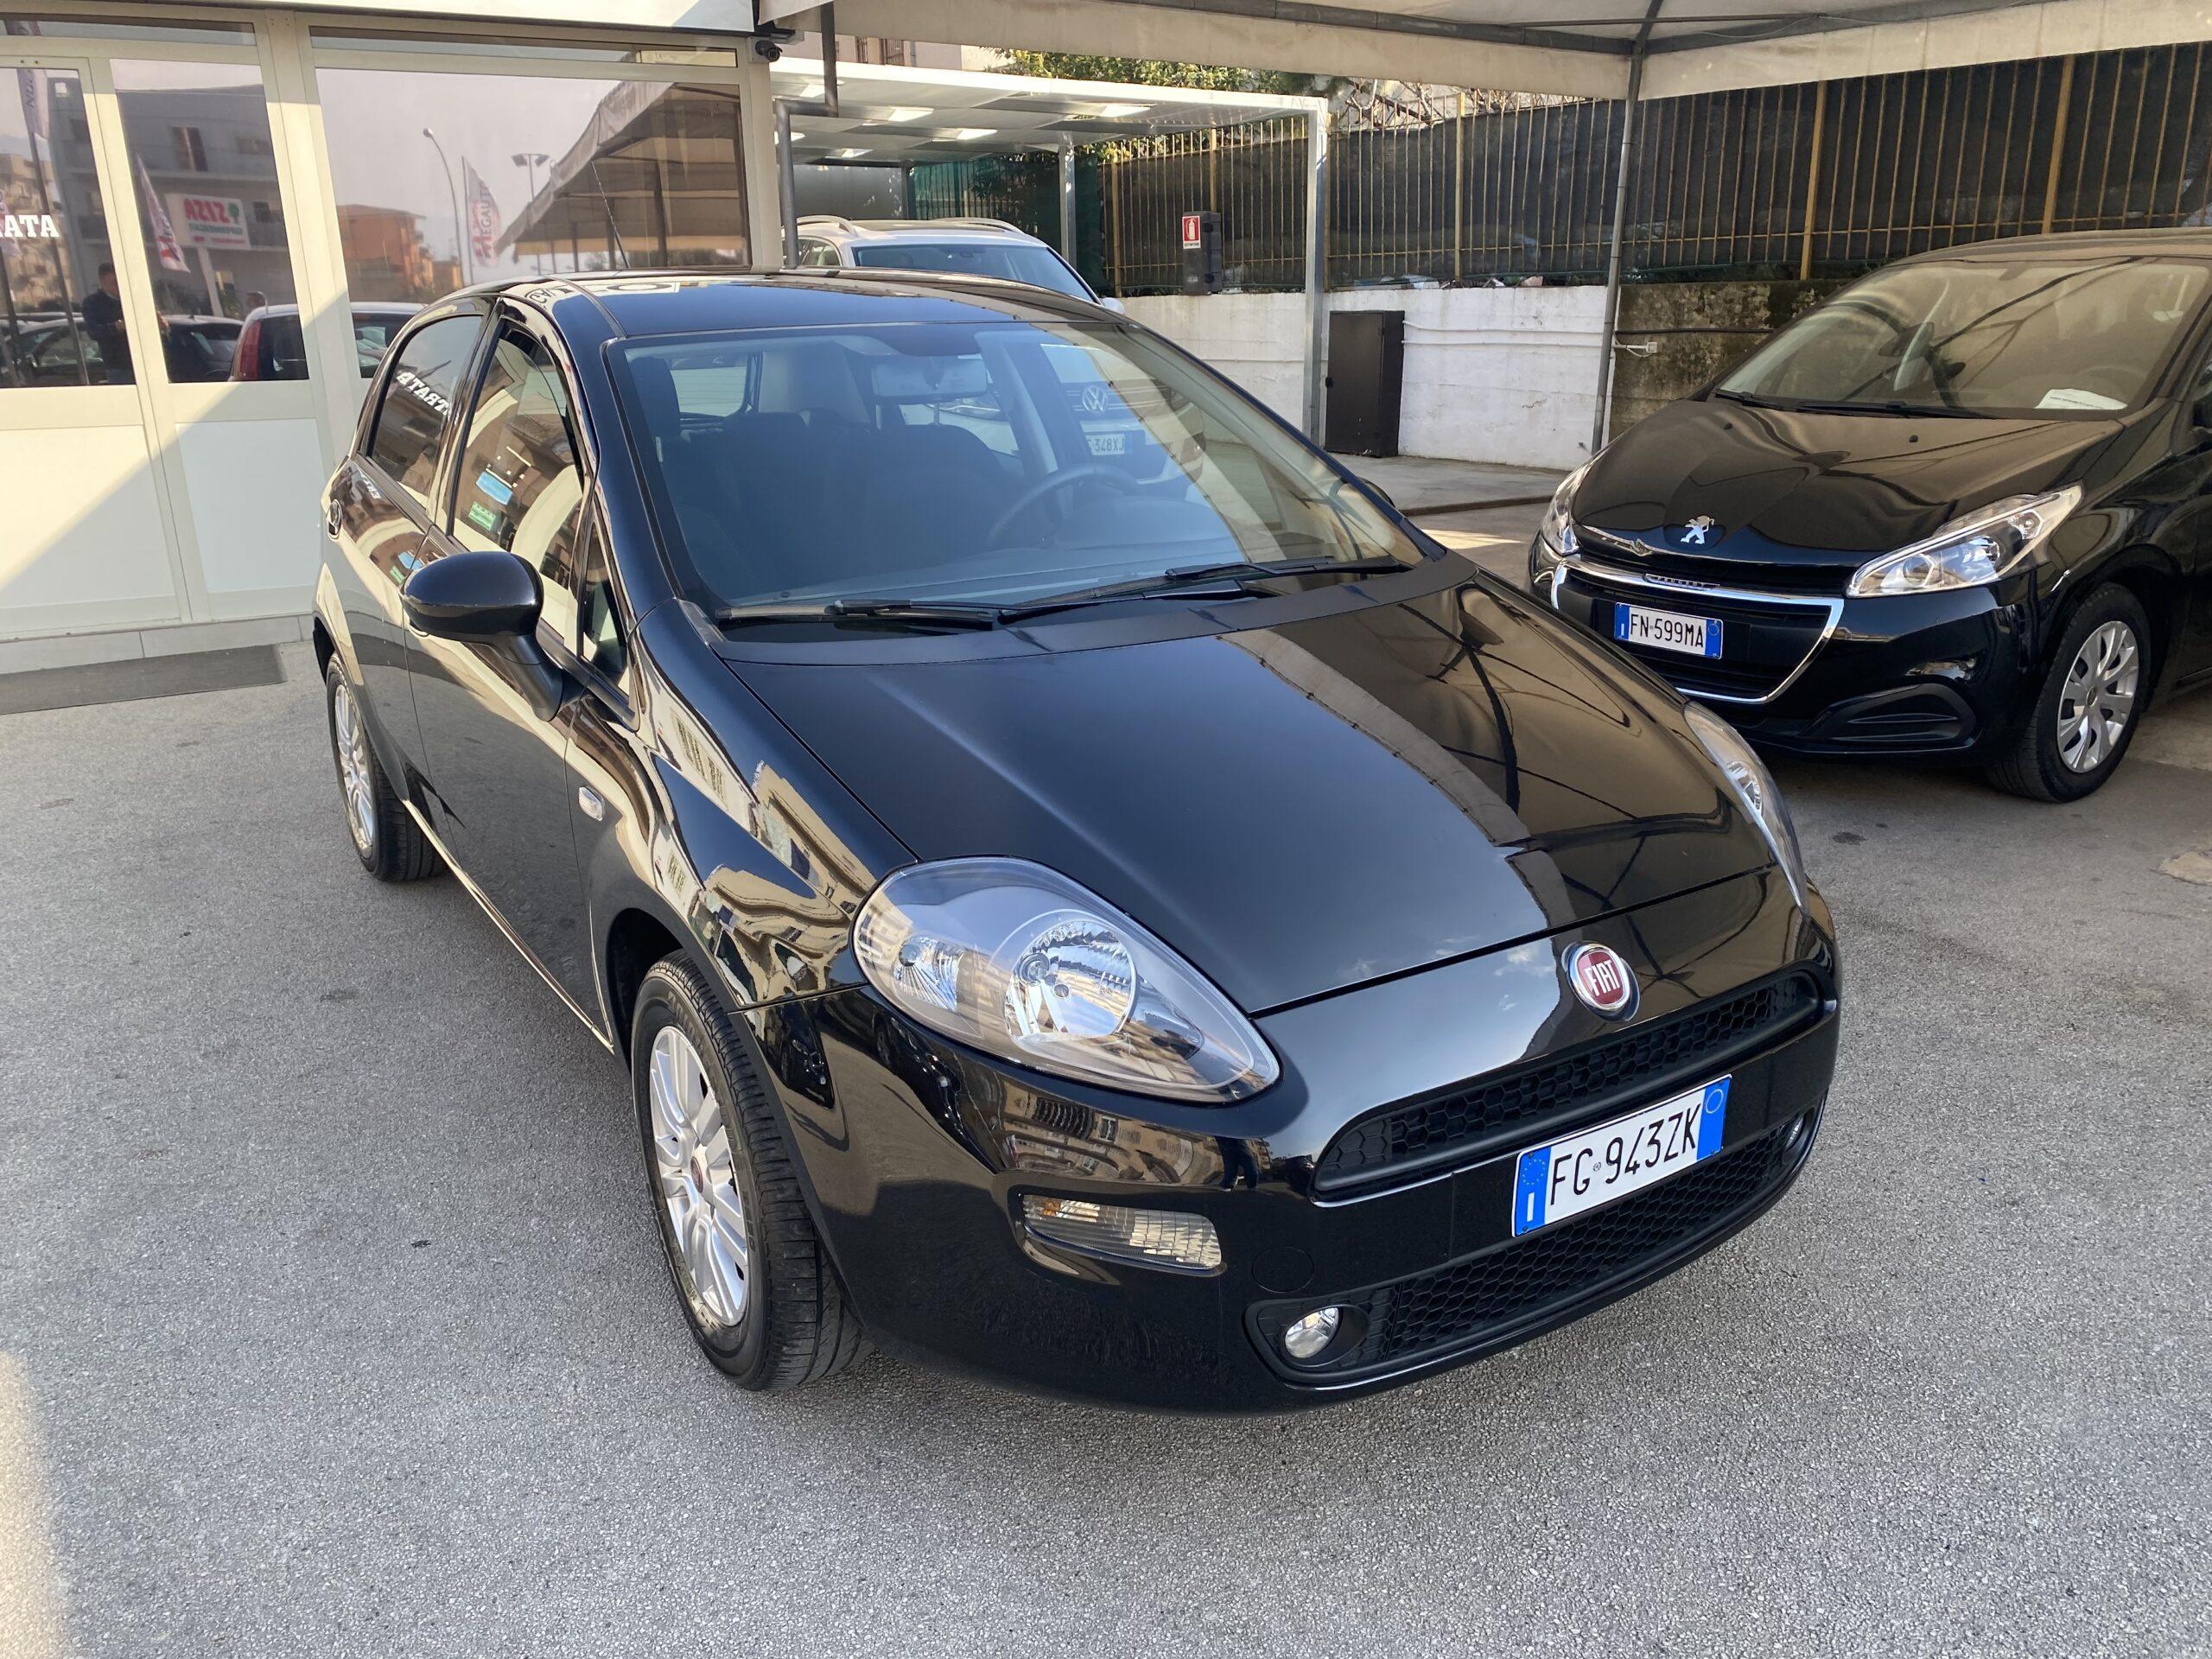 Fiat Grande Punto 1.2 8V 5 Porte Lounge